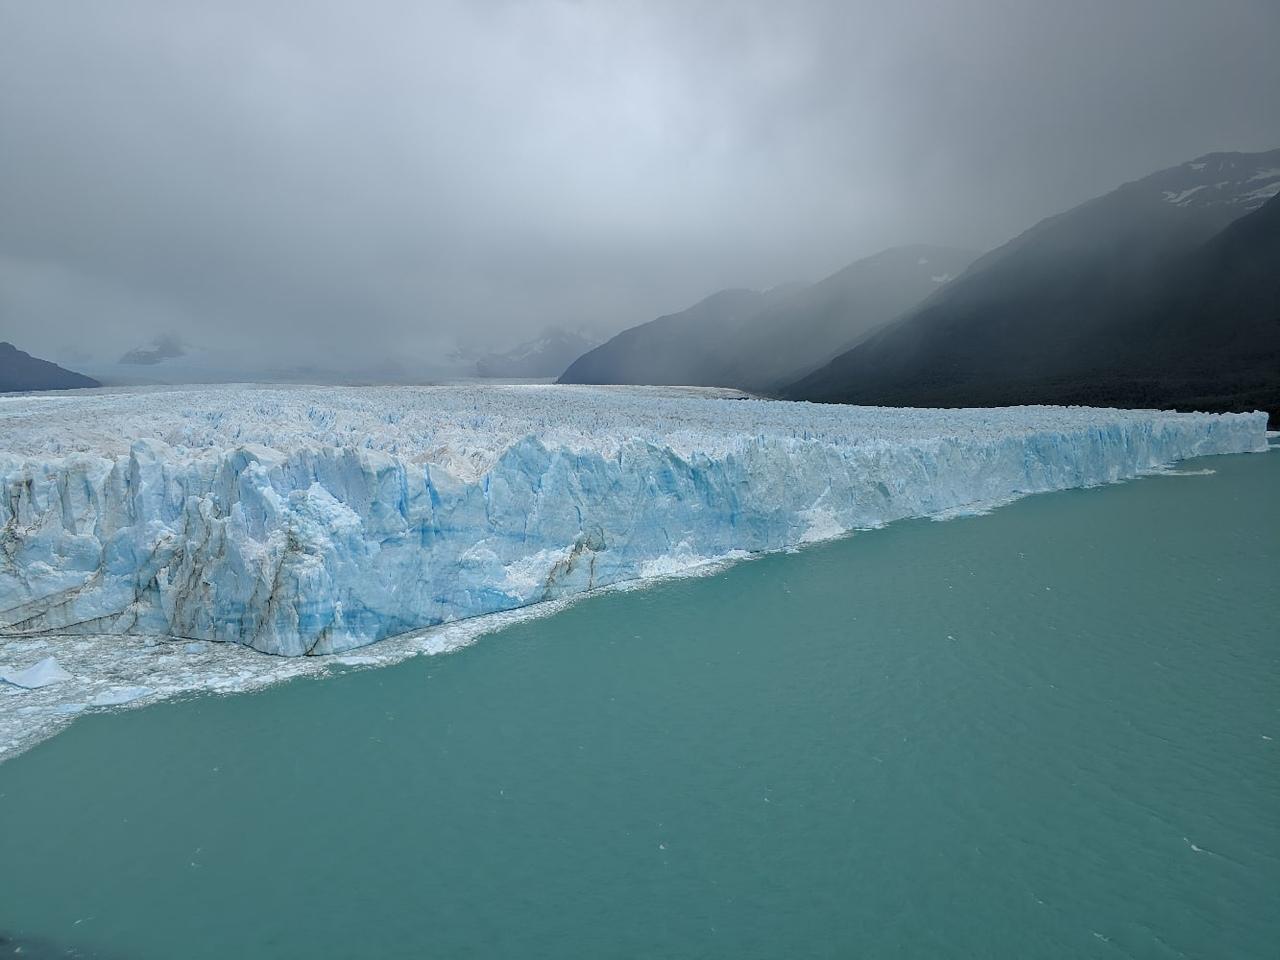 Аргентина. Эль-Калафате. Ледник Перито-Морено.